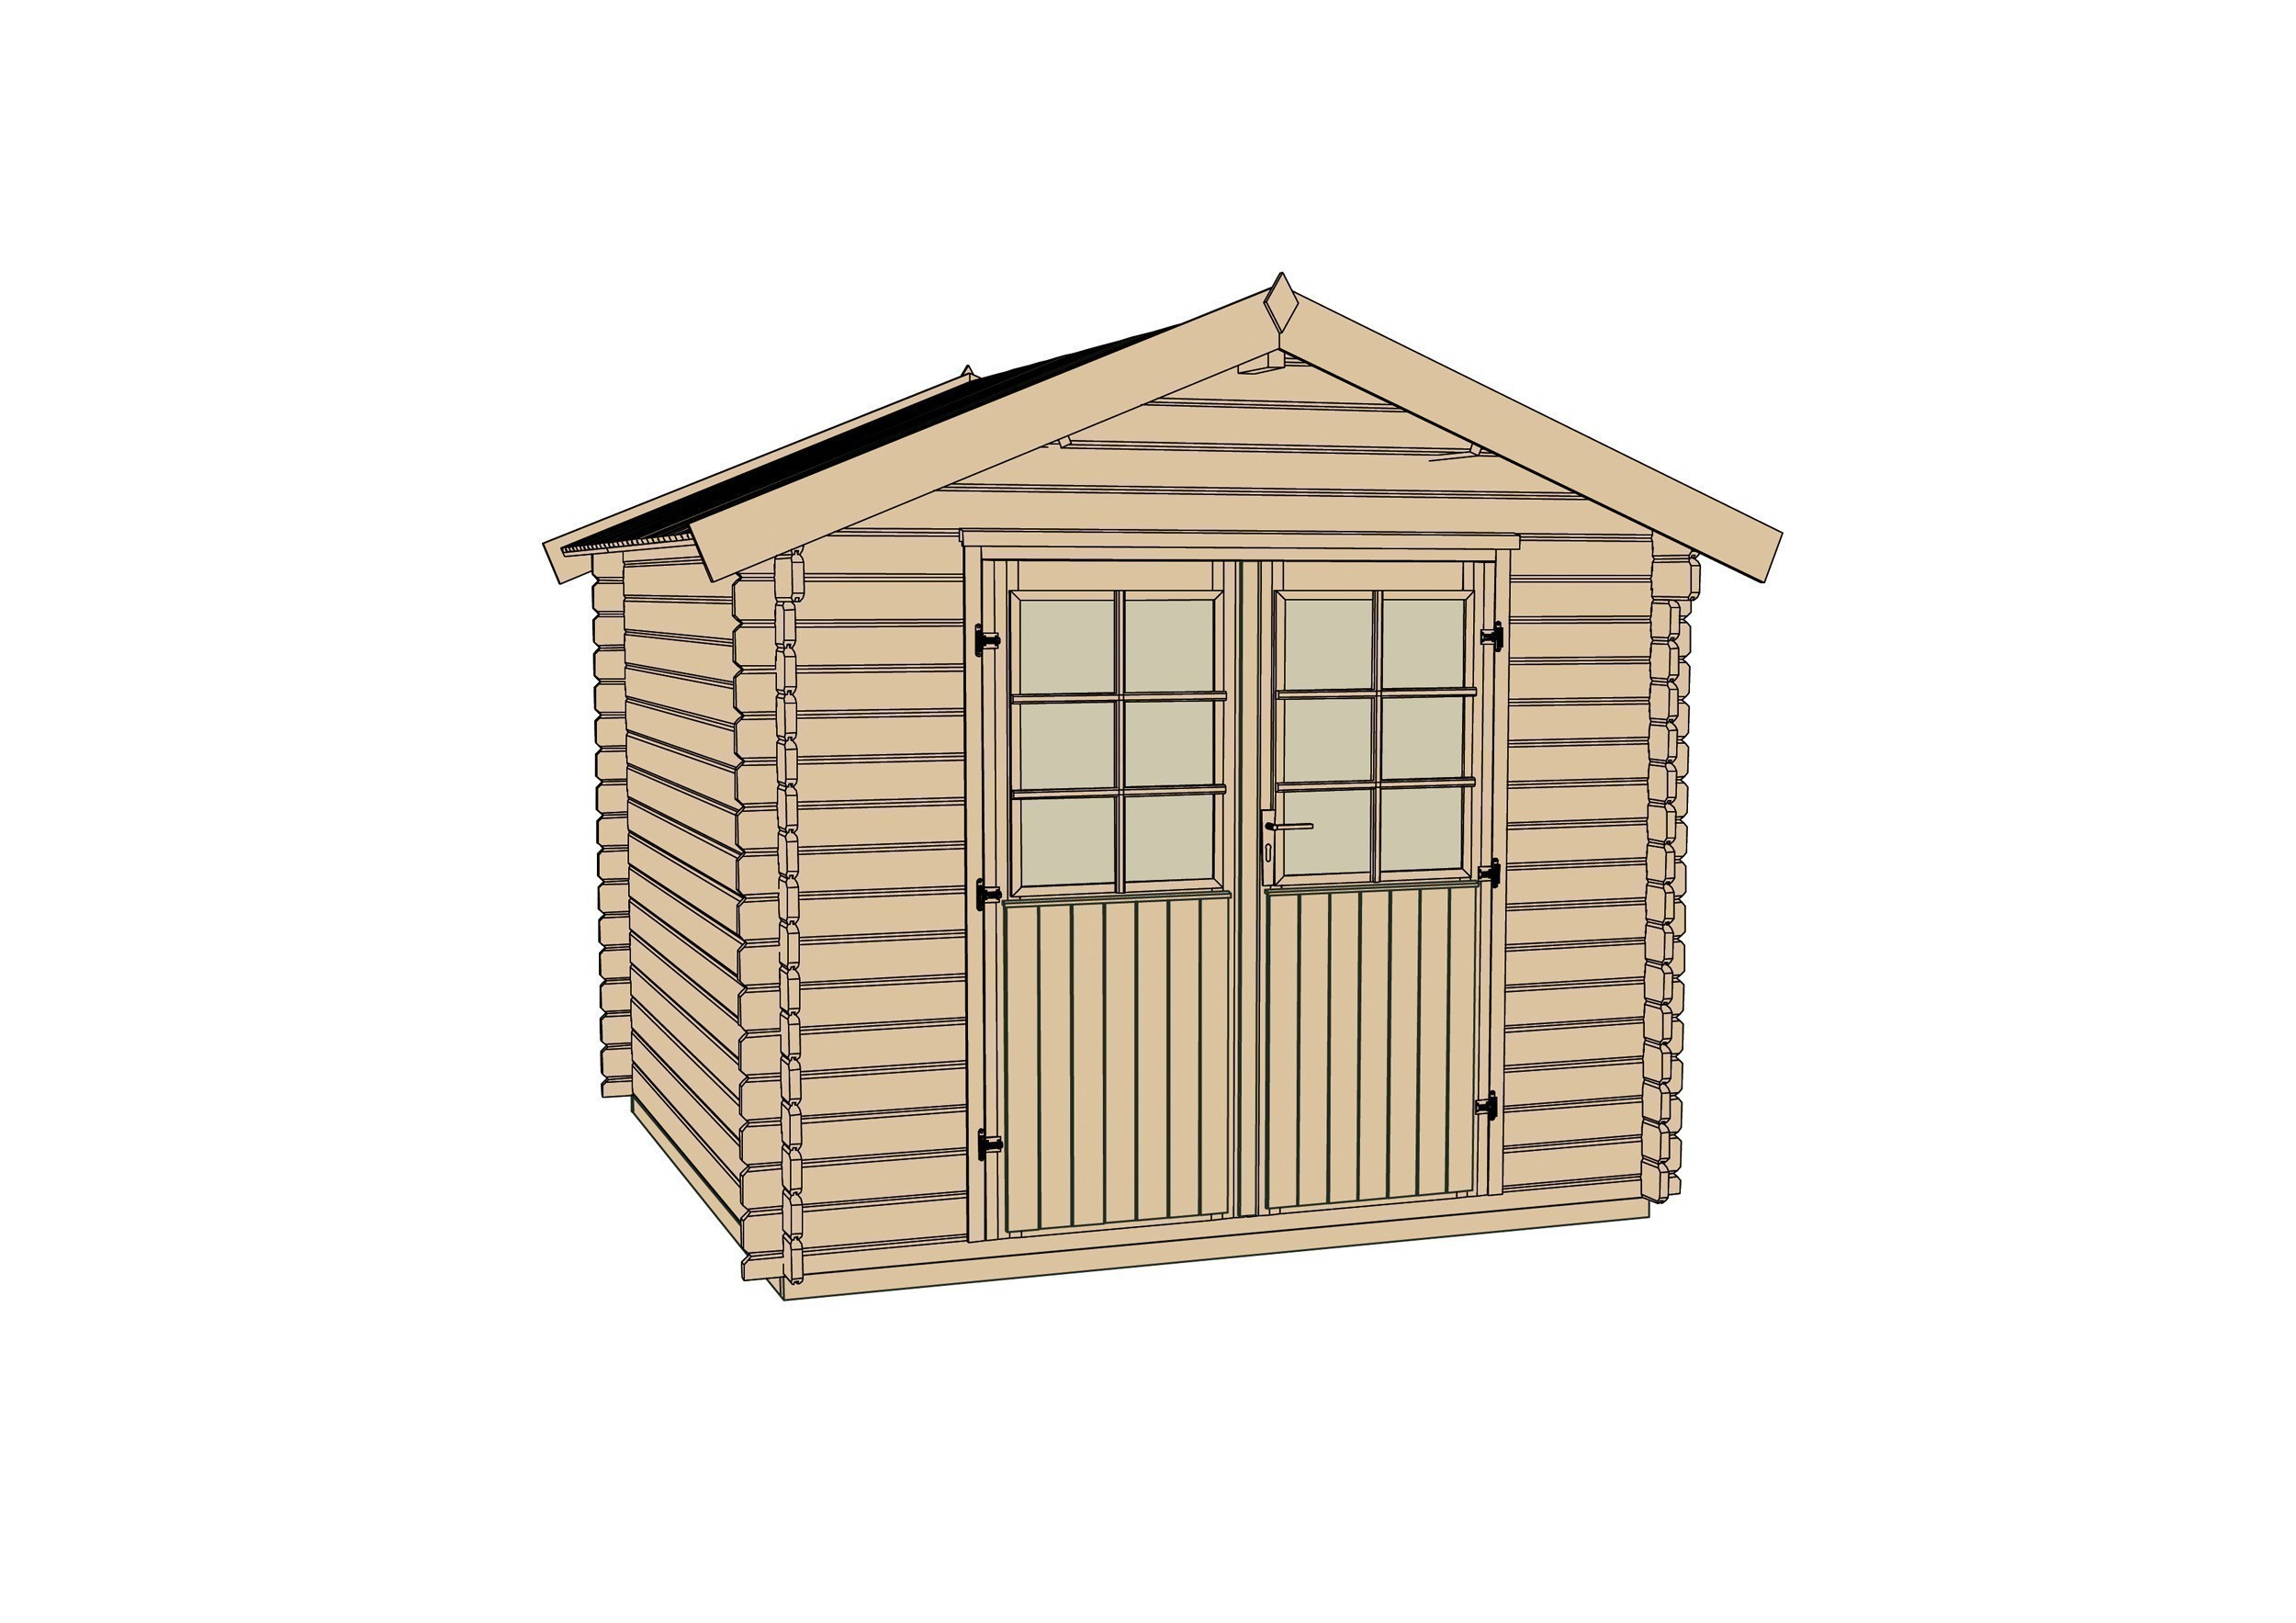 weka ger tehaus 28mm gartenhaus 209 gr 1 natur 253x230cm bei. Black Bedroom Furniture Sets. Home Design Ideas